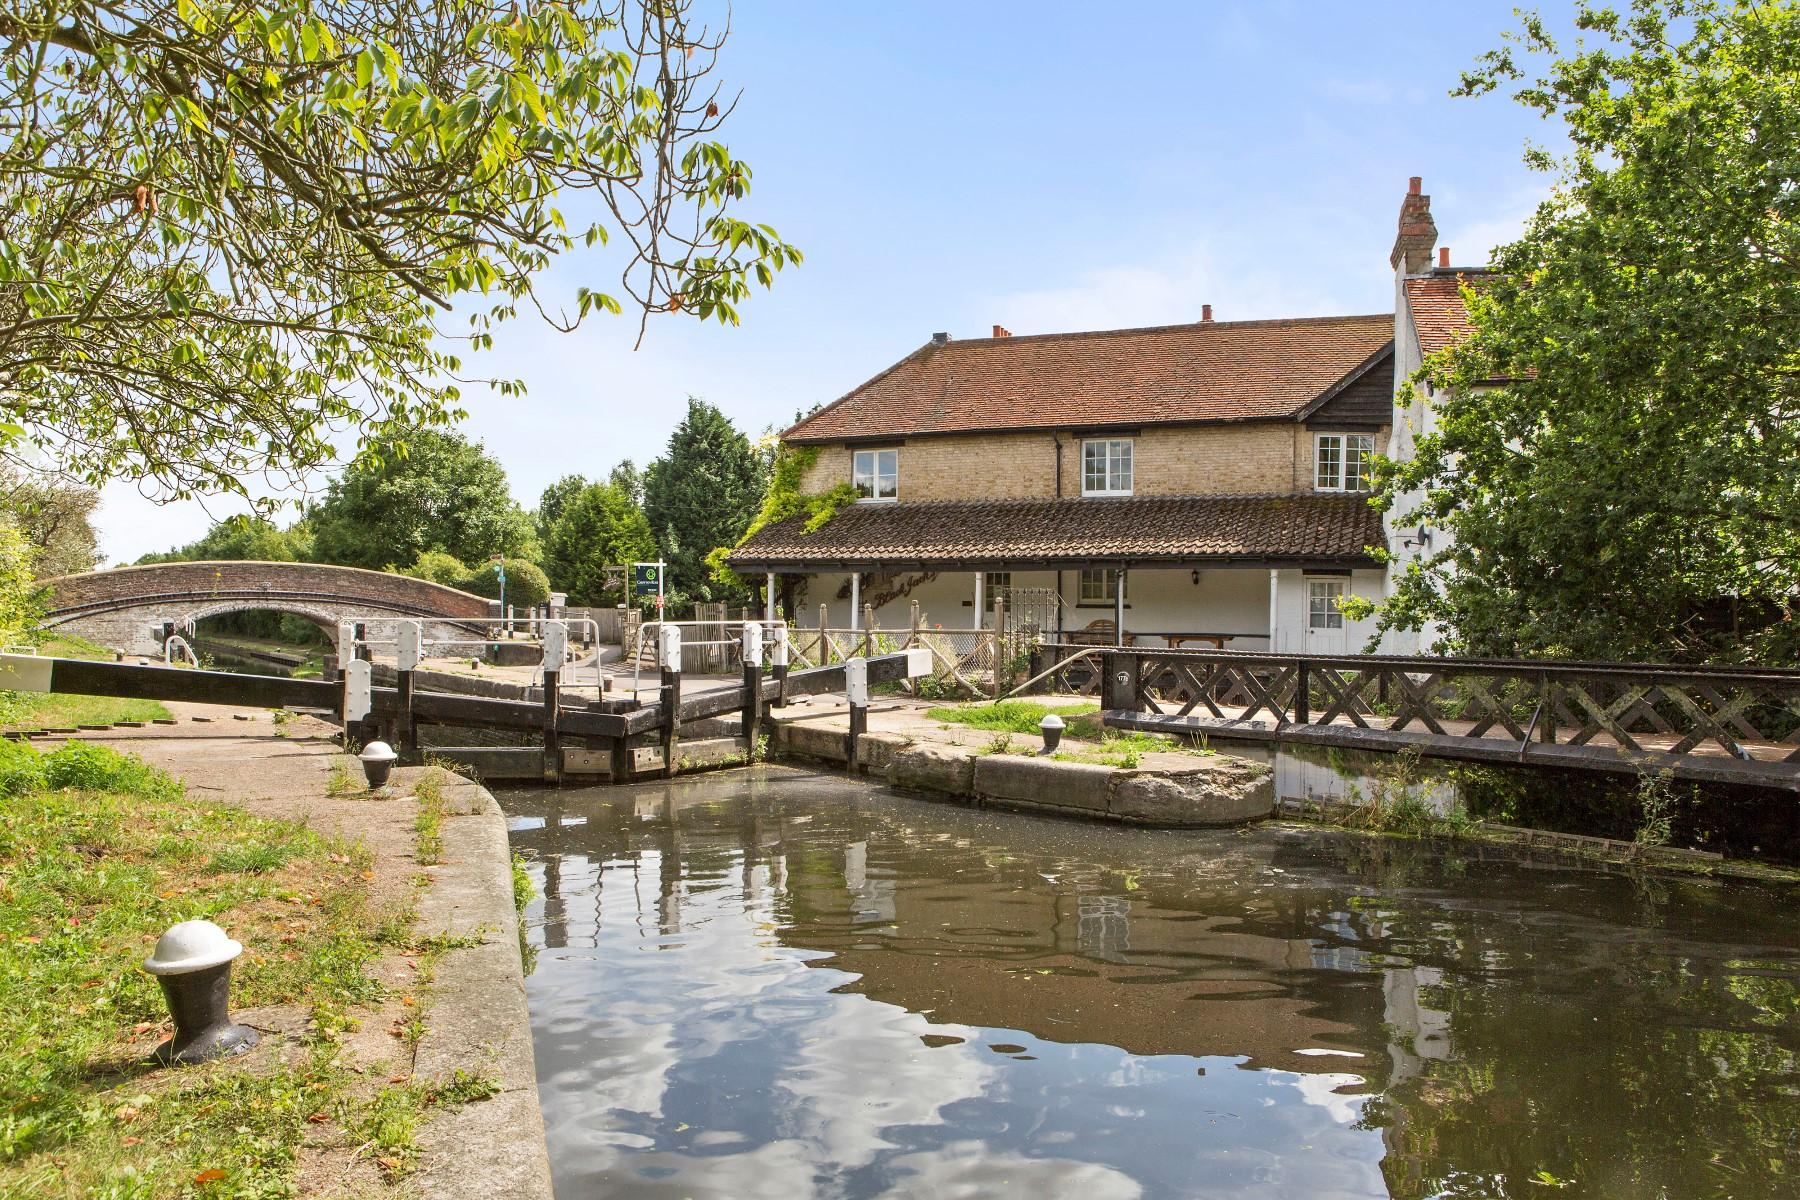 Single Family Home for Sale at Harefield Blackjacks Lock Harefield, England UB96HL United Kingdom